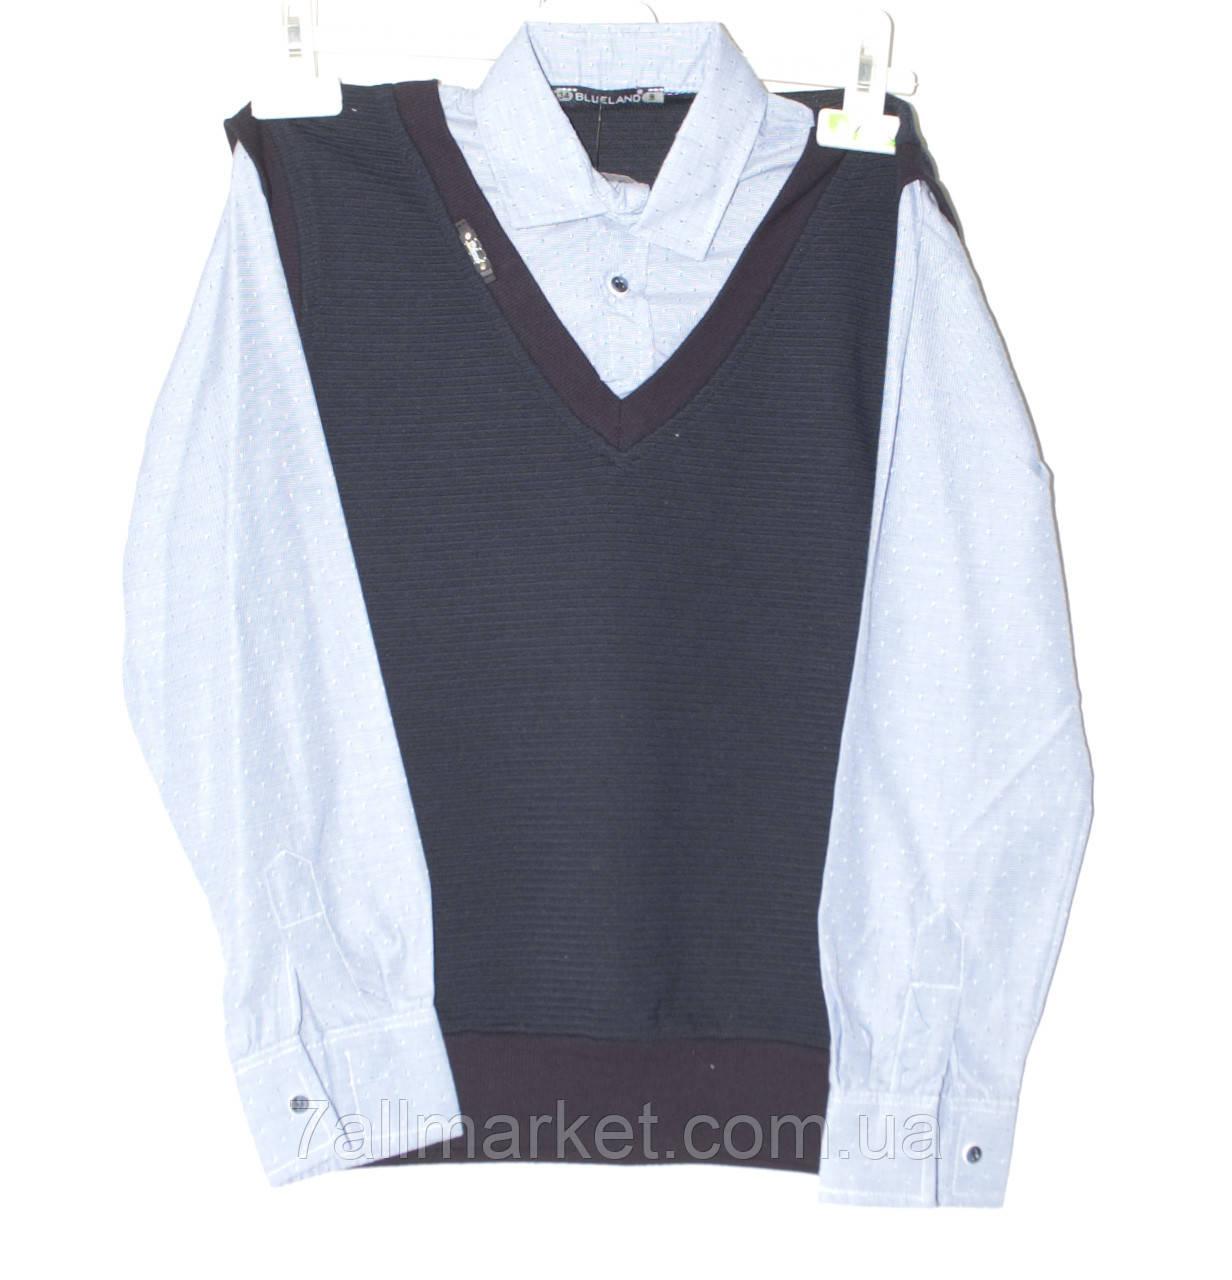 d0ede5e28cc Рубашка-обманка школьная на мальчика 134-170 см Серии